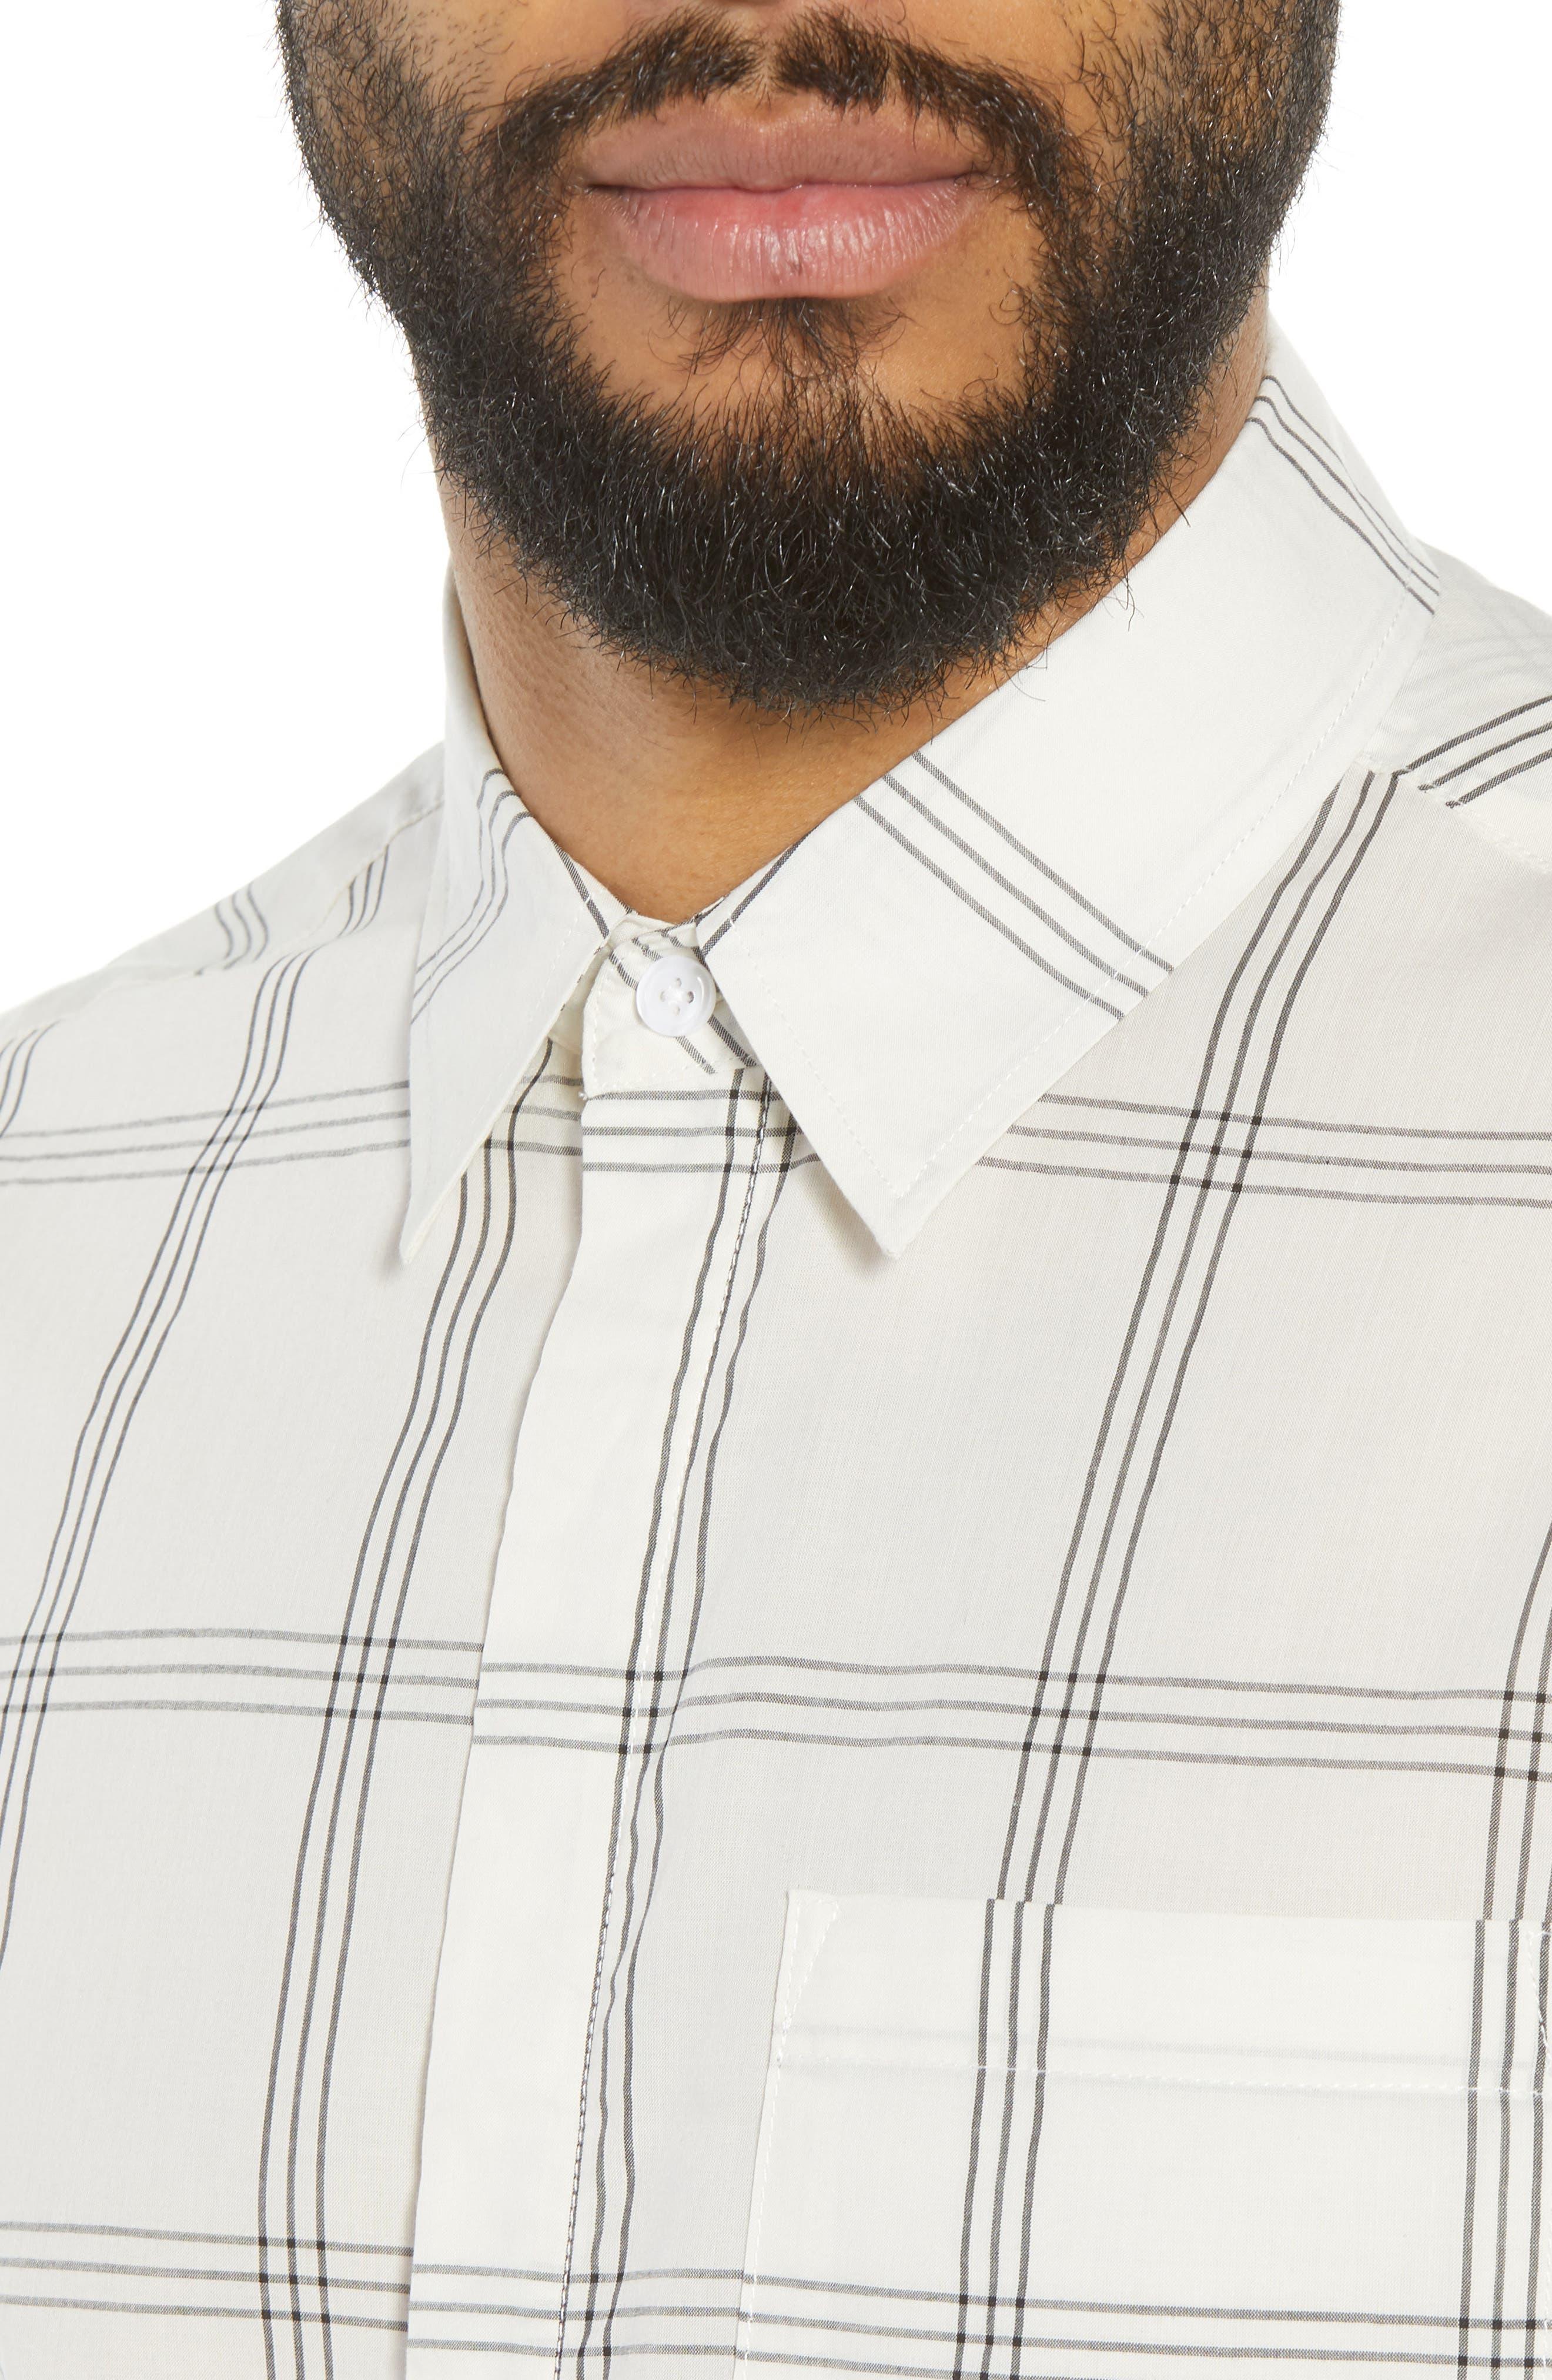 Mickey Windowpane Woven Shirt,                             Alternate thumbnail 2, color,                             White